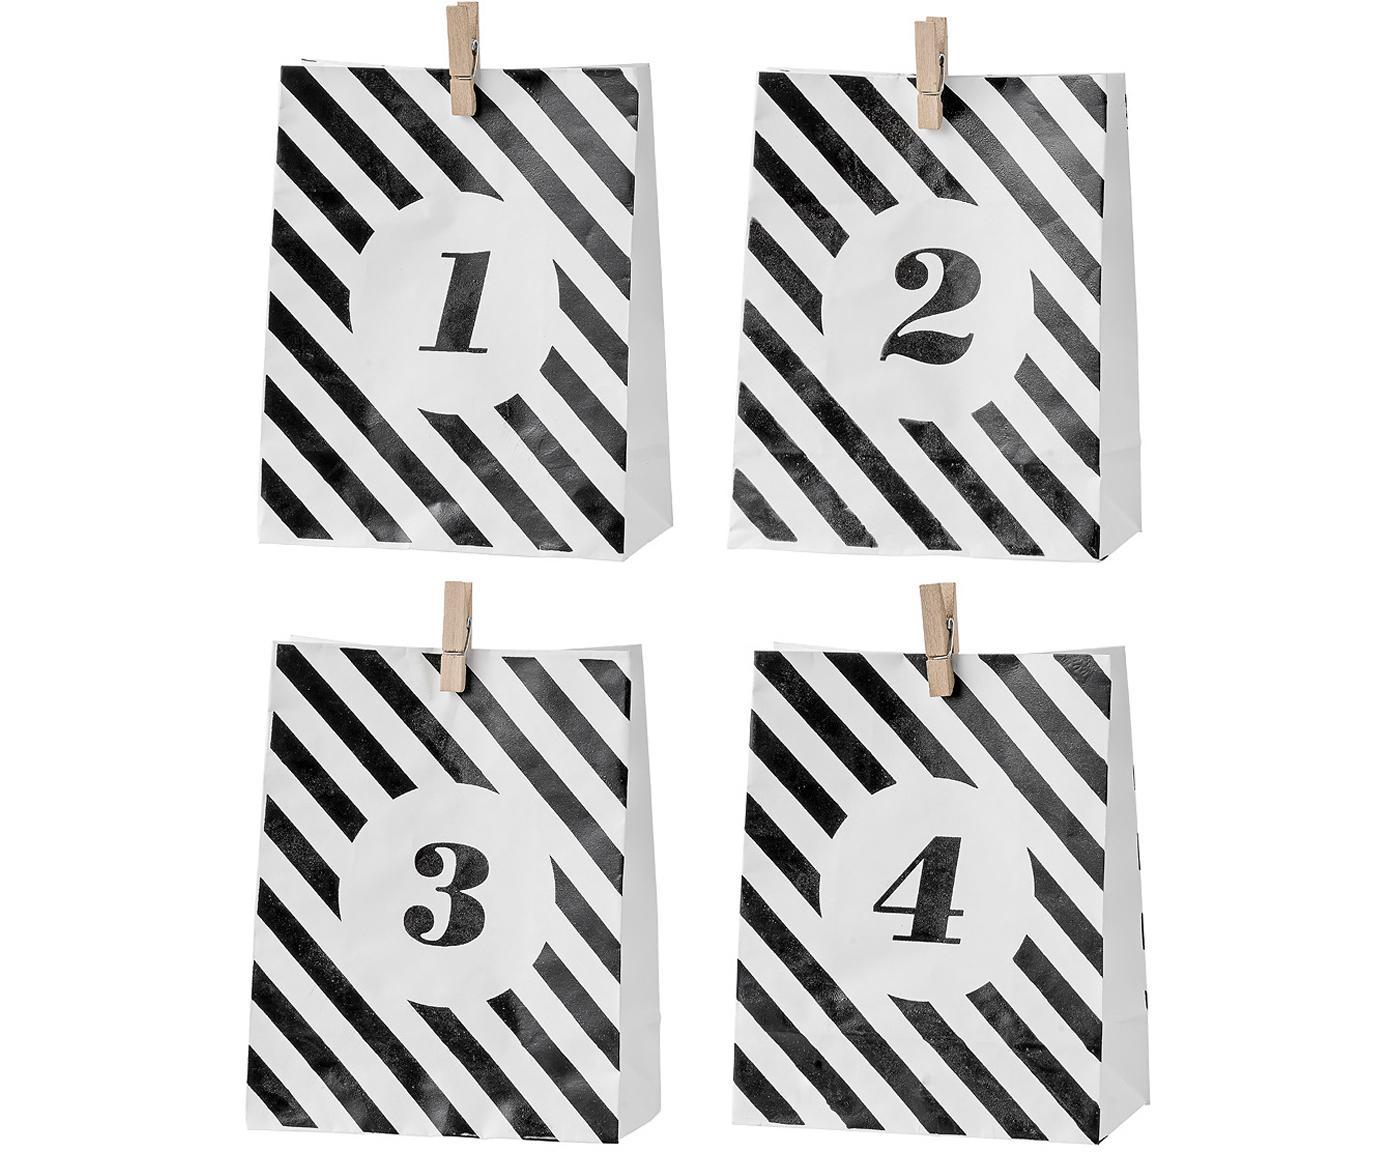 Set 4 sacchetti di carta Avvento, Carta, Nero, bianco, Larg. 15 x Alt. 18 cm